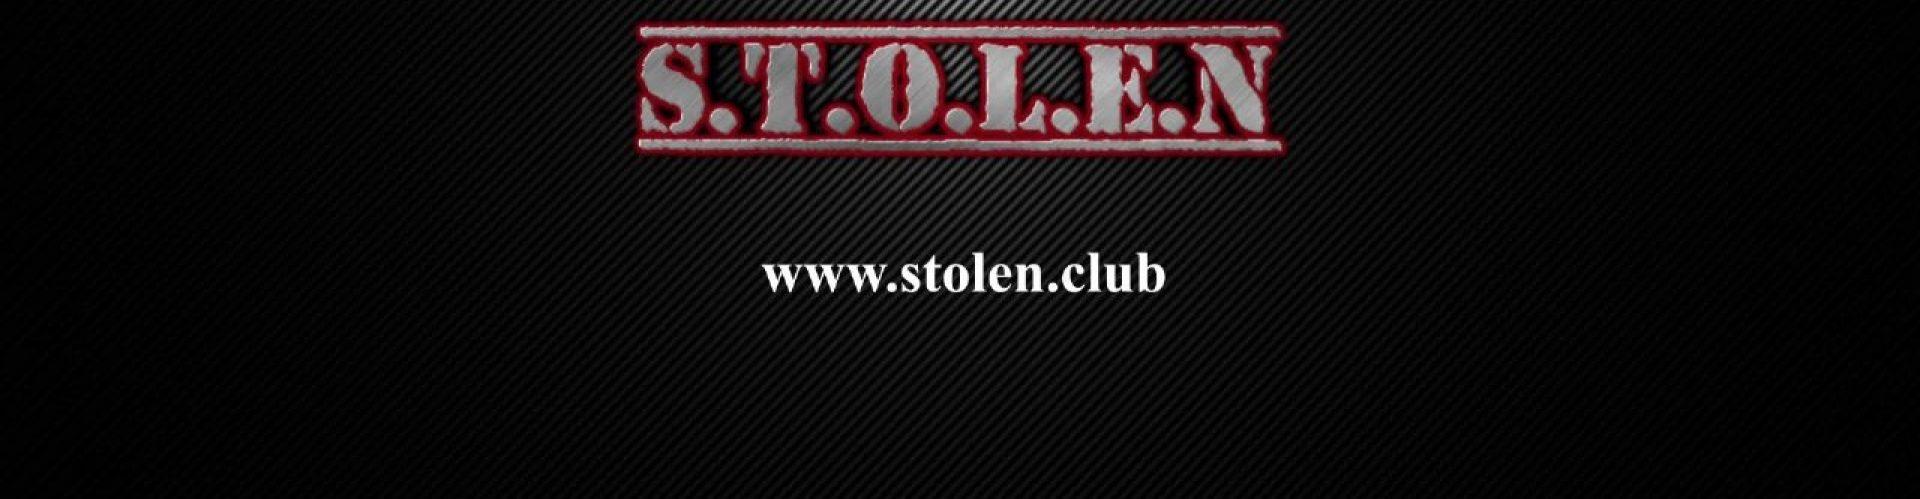 S.T.O.L.E.N  Productions